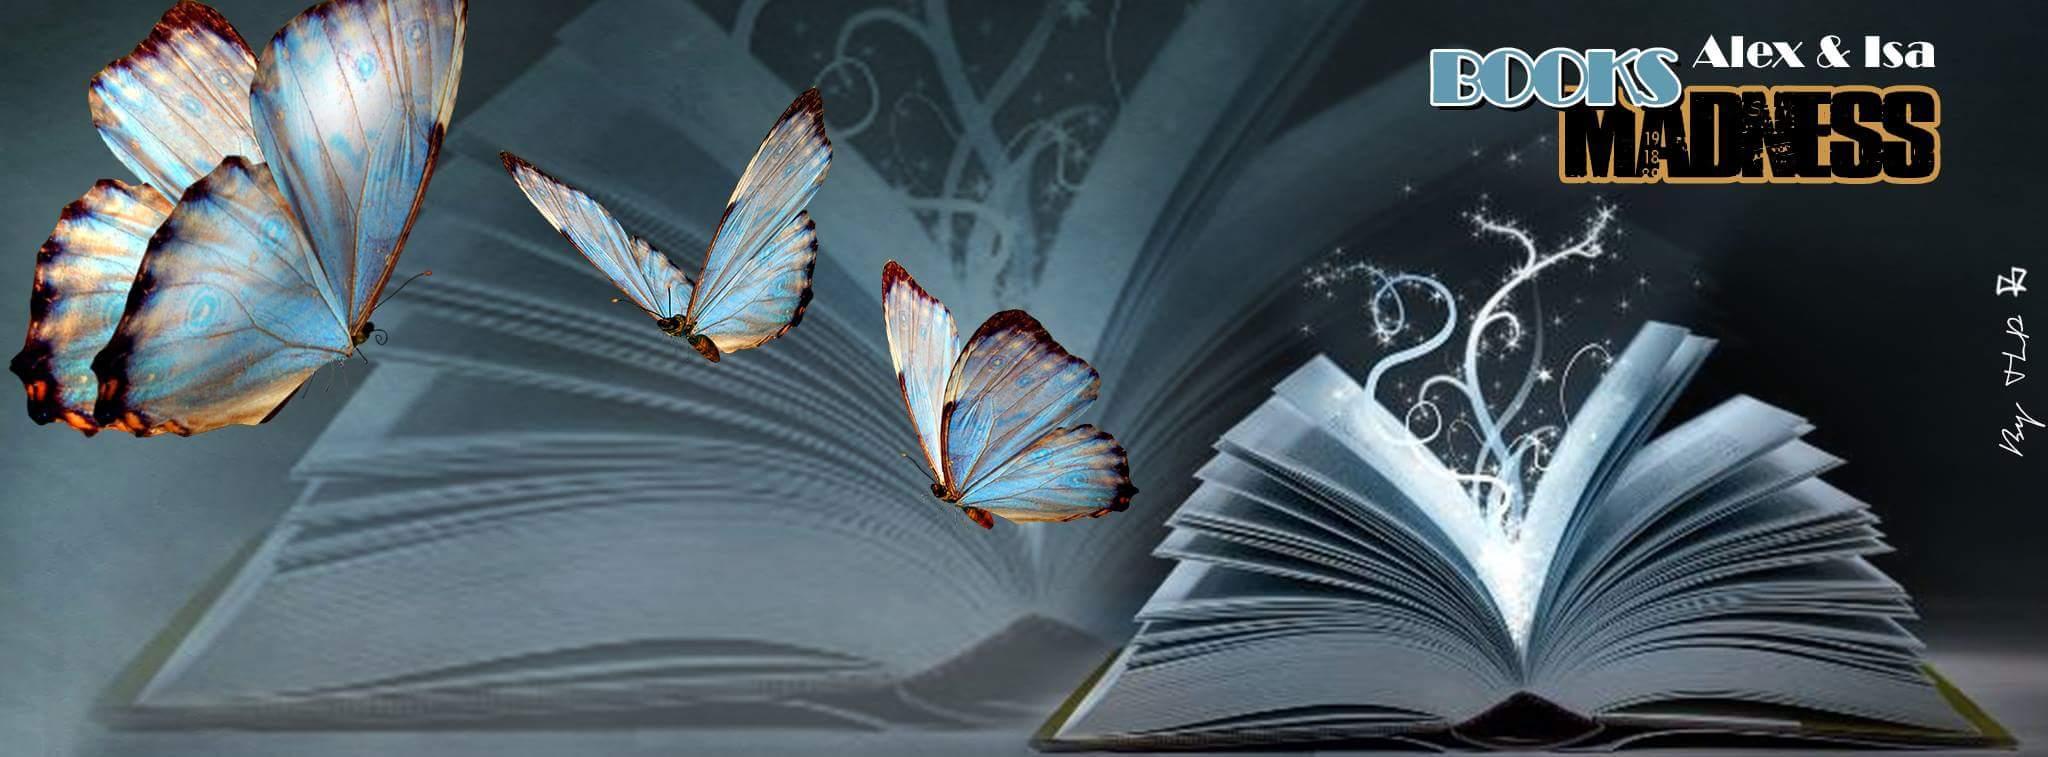 Booksmadness